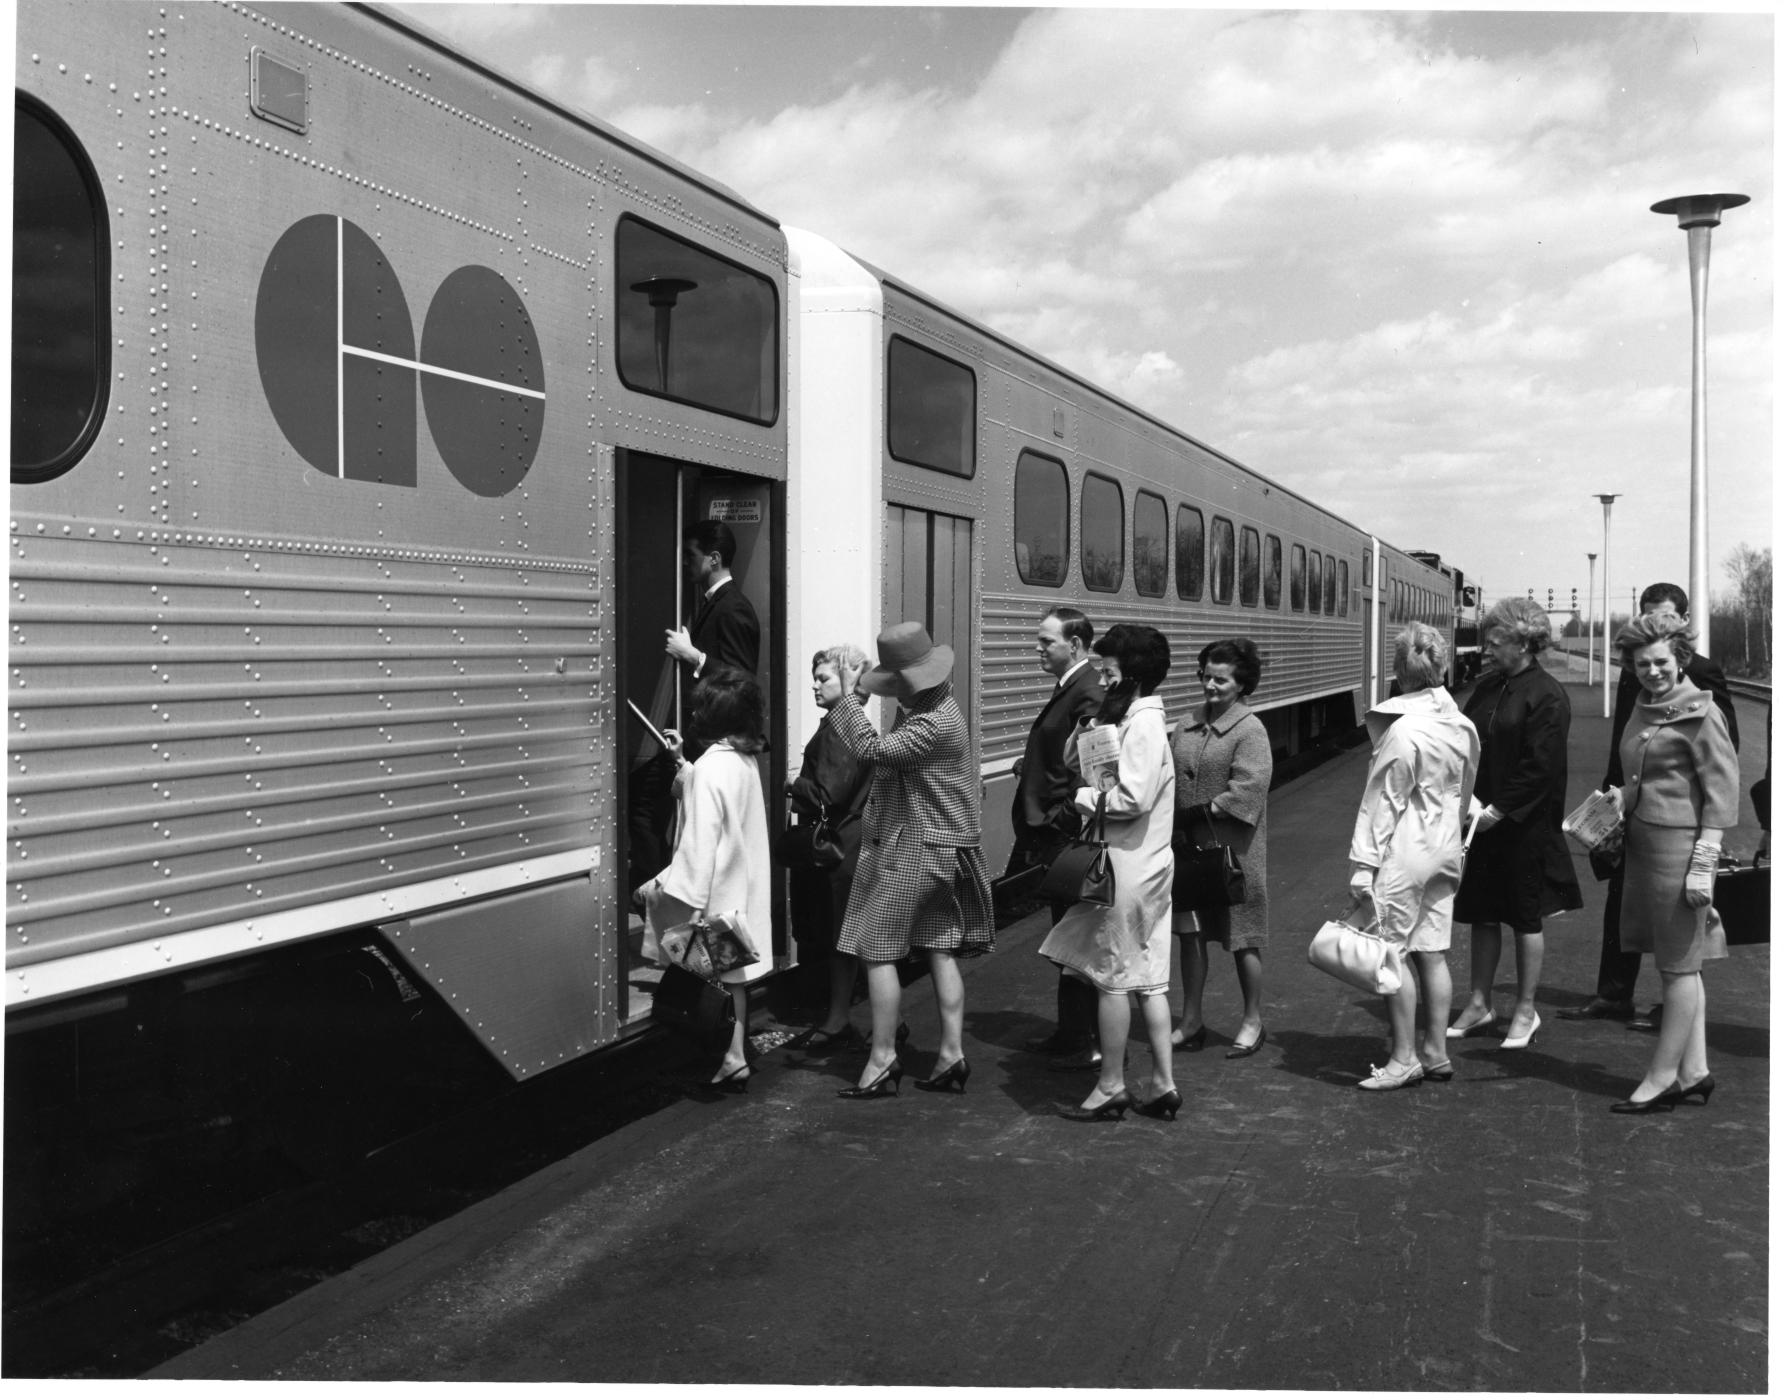 Customers boarding a GO train in the 1960s when GO trains were still single leve